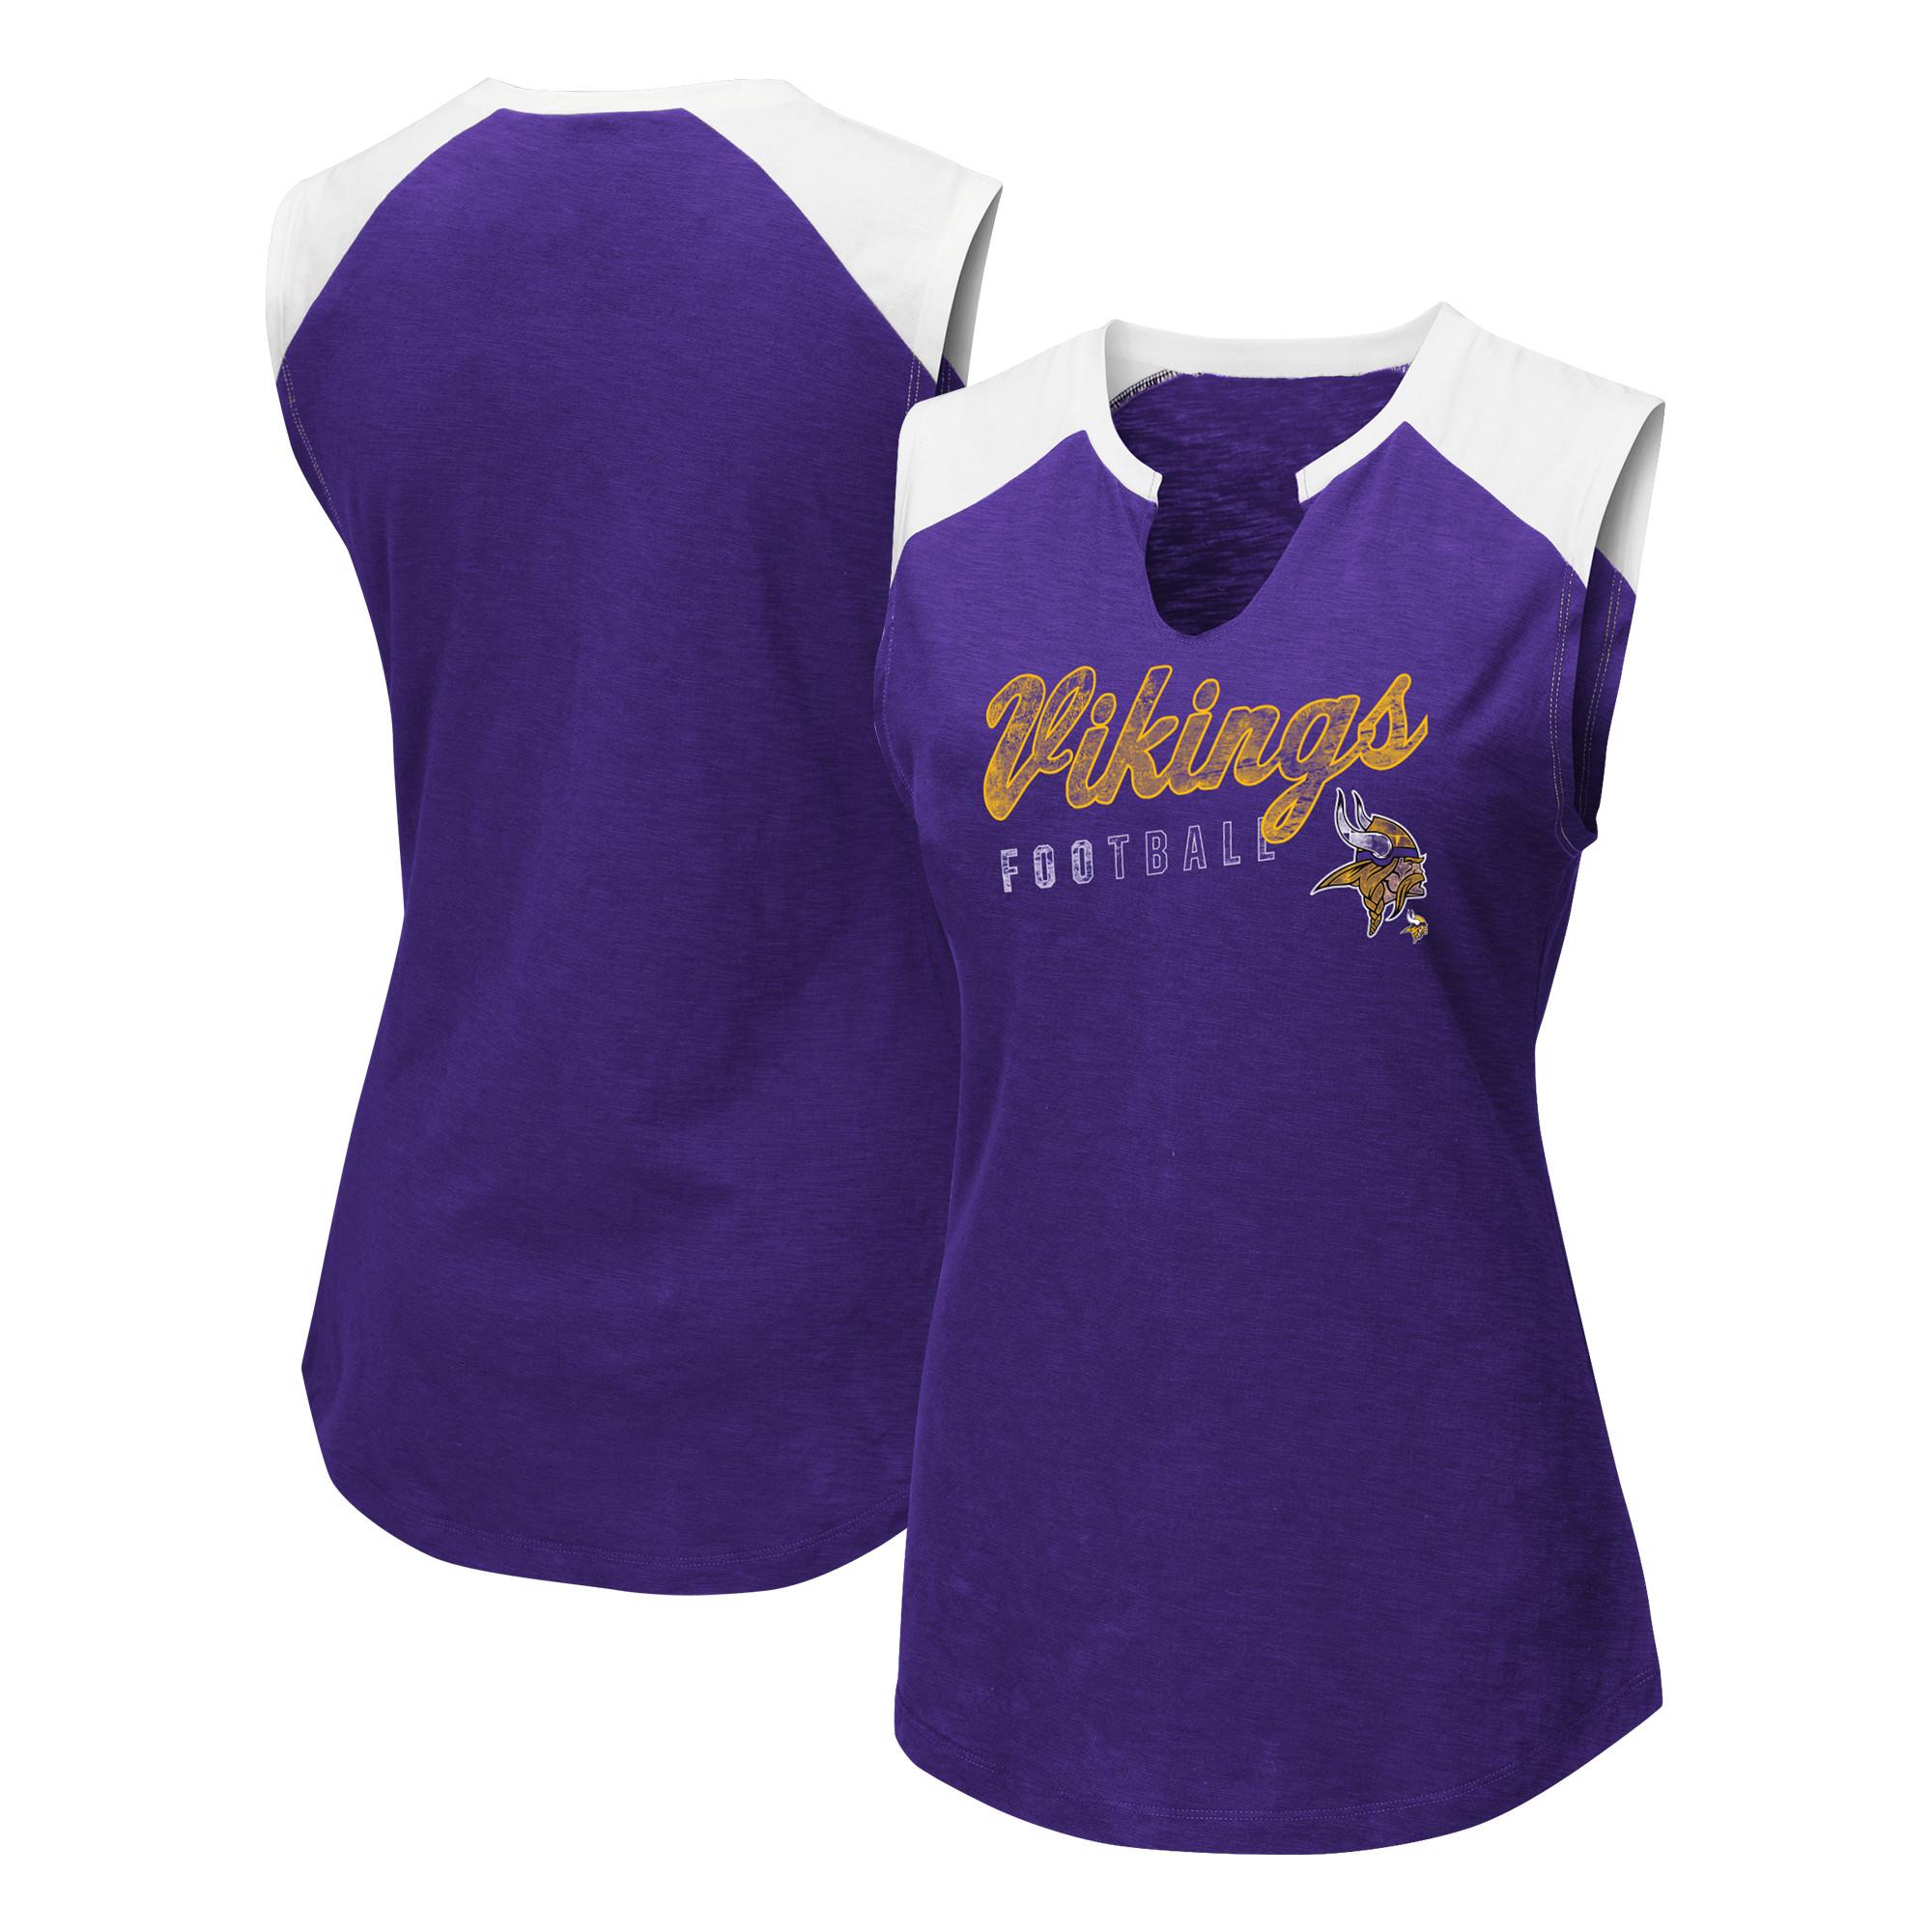 Minnesota Vikings Majestic Women's V-Notch Muscle Tank Top - Purple/White